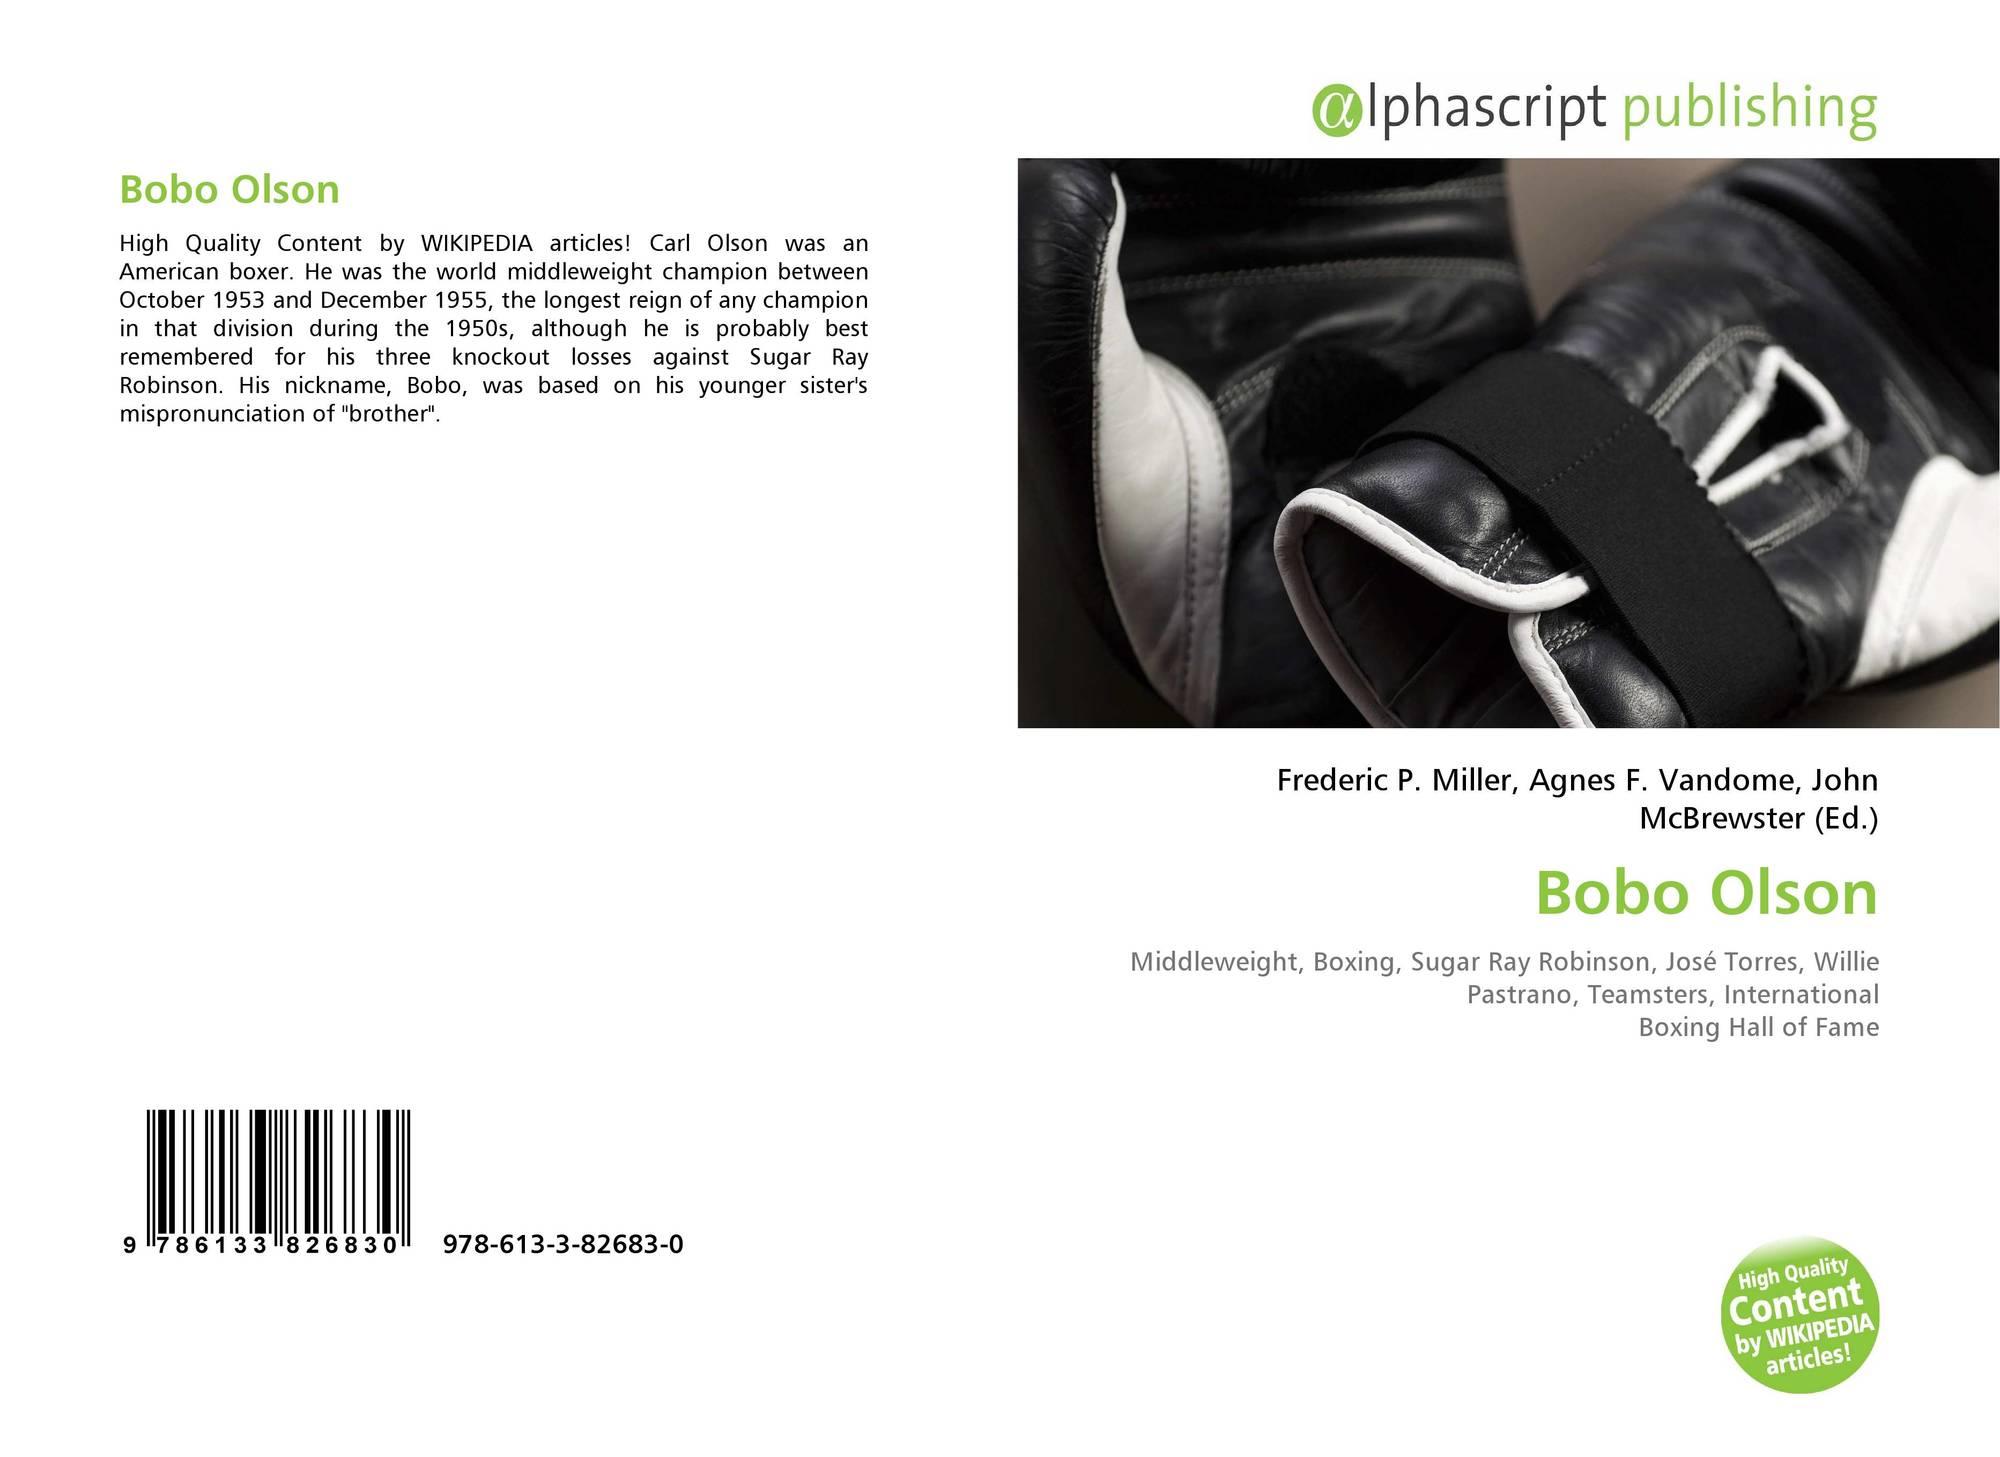 Bobo Olson, 978-613-3-82683-0, 6133826835 ,9786133826830